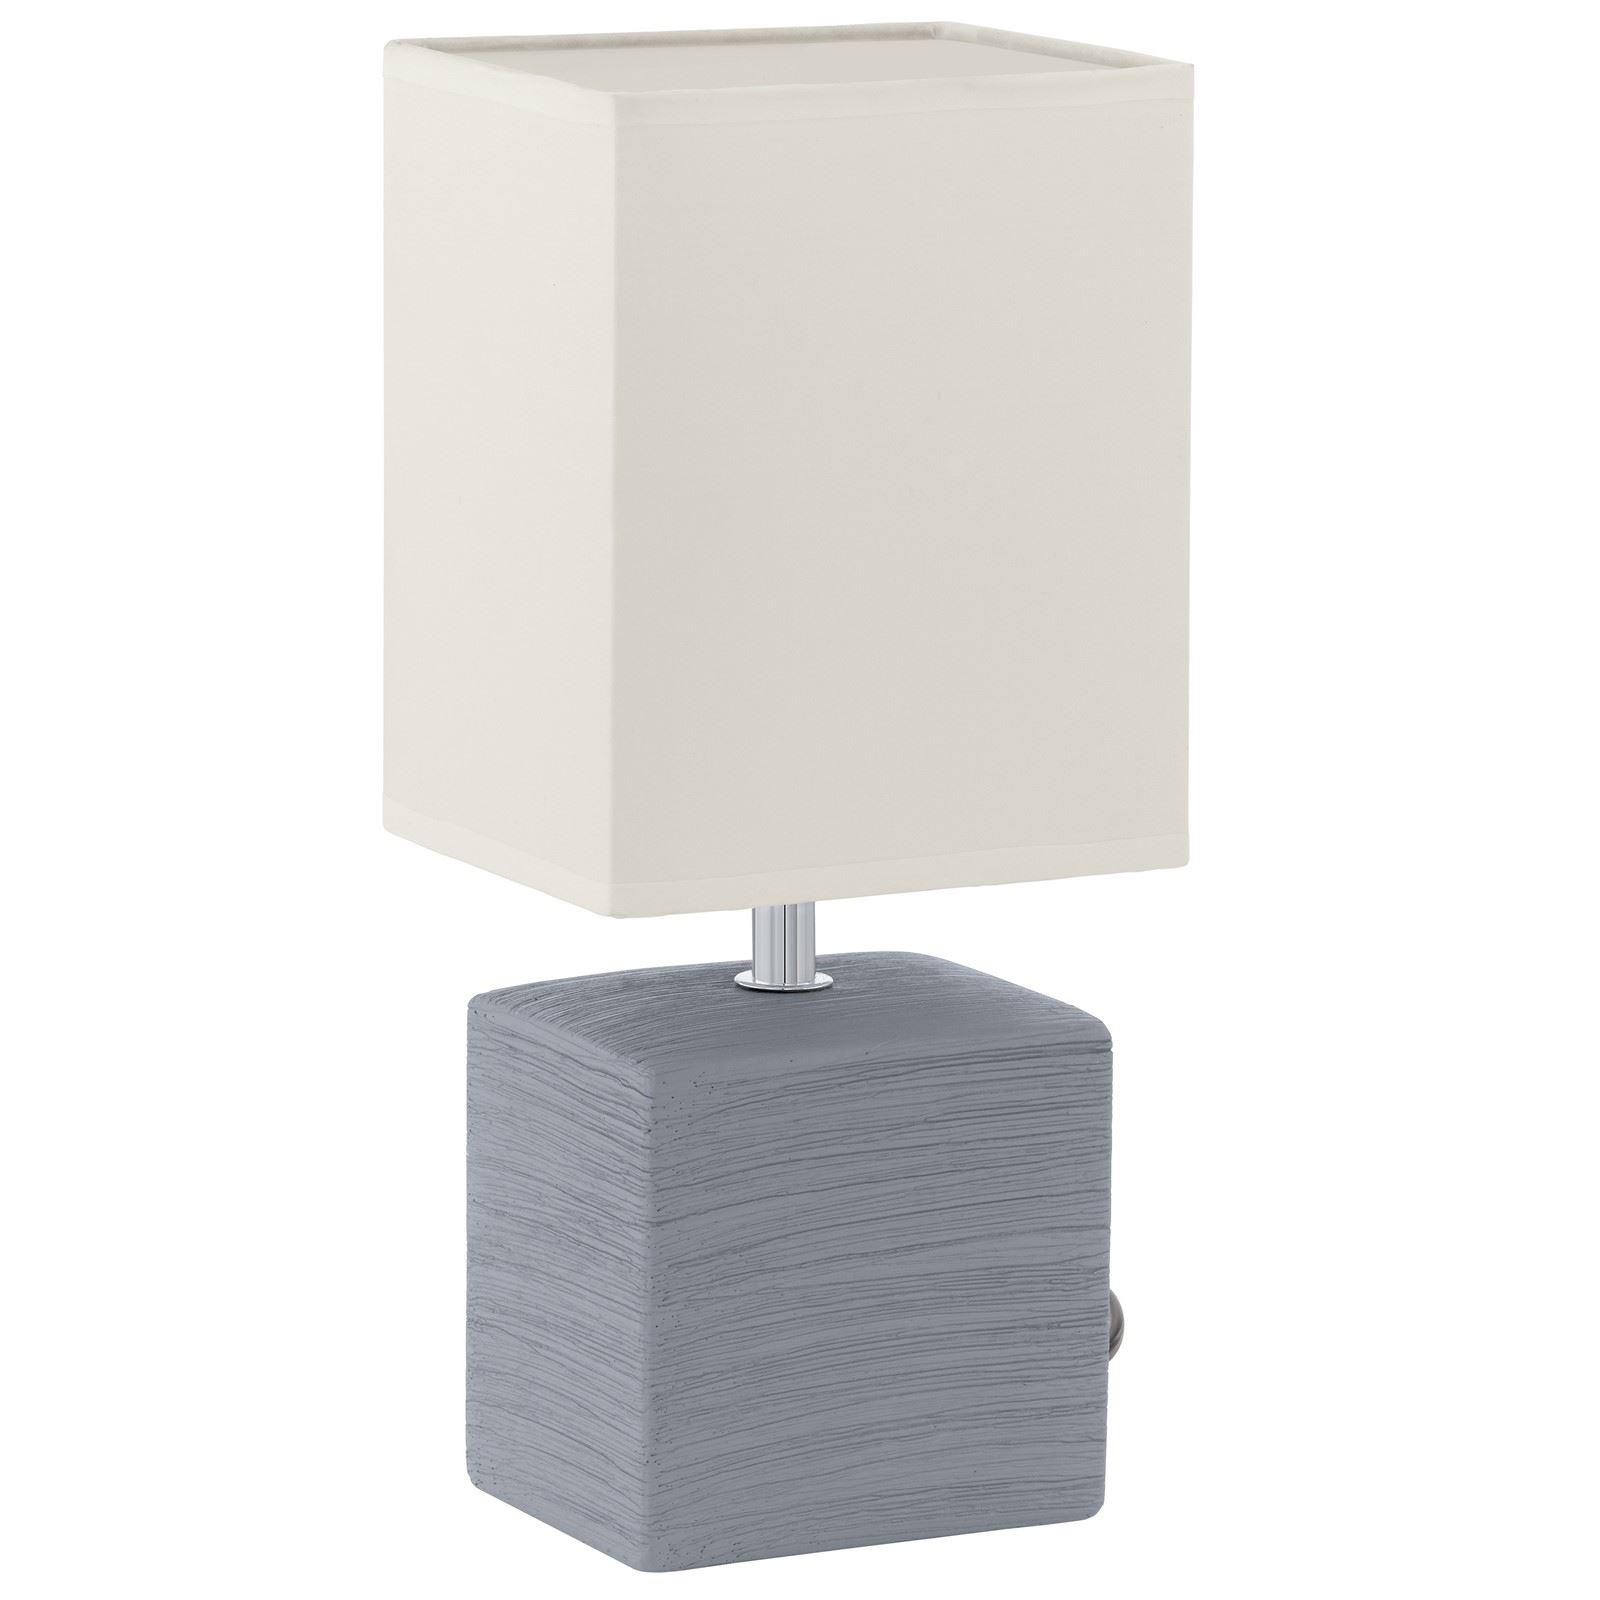 Mataro Modern Ceramic Table Lamp 1 Light E14 Grey White Fabric